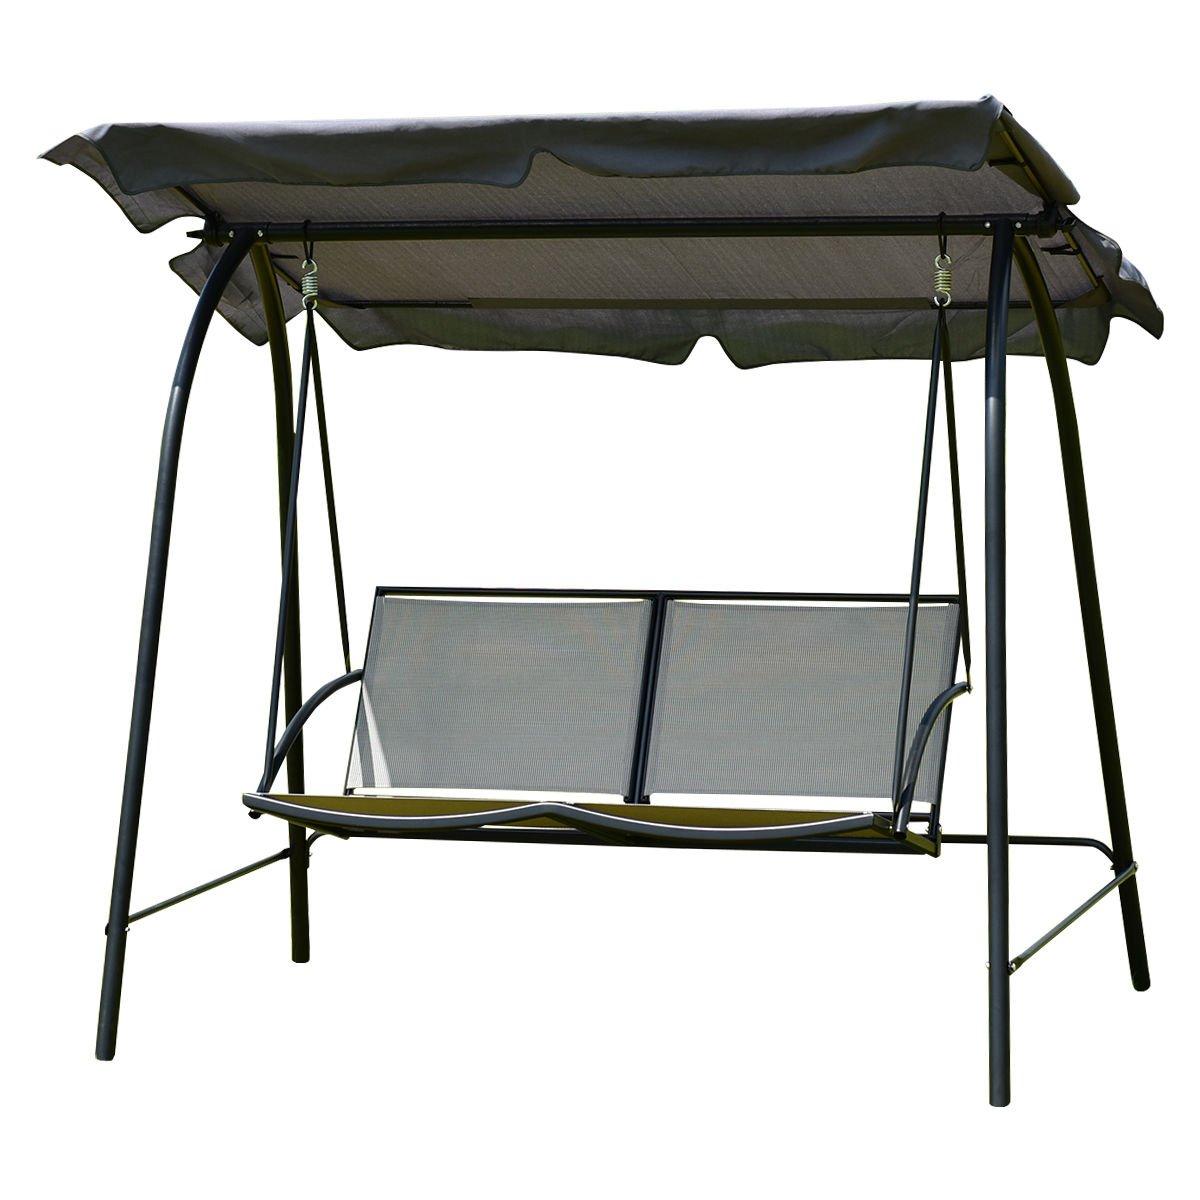 TANGKULA 2 Person Patio Swing Glider Outdoor Loveseat Swing Hammock Glider Chair (Grey)